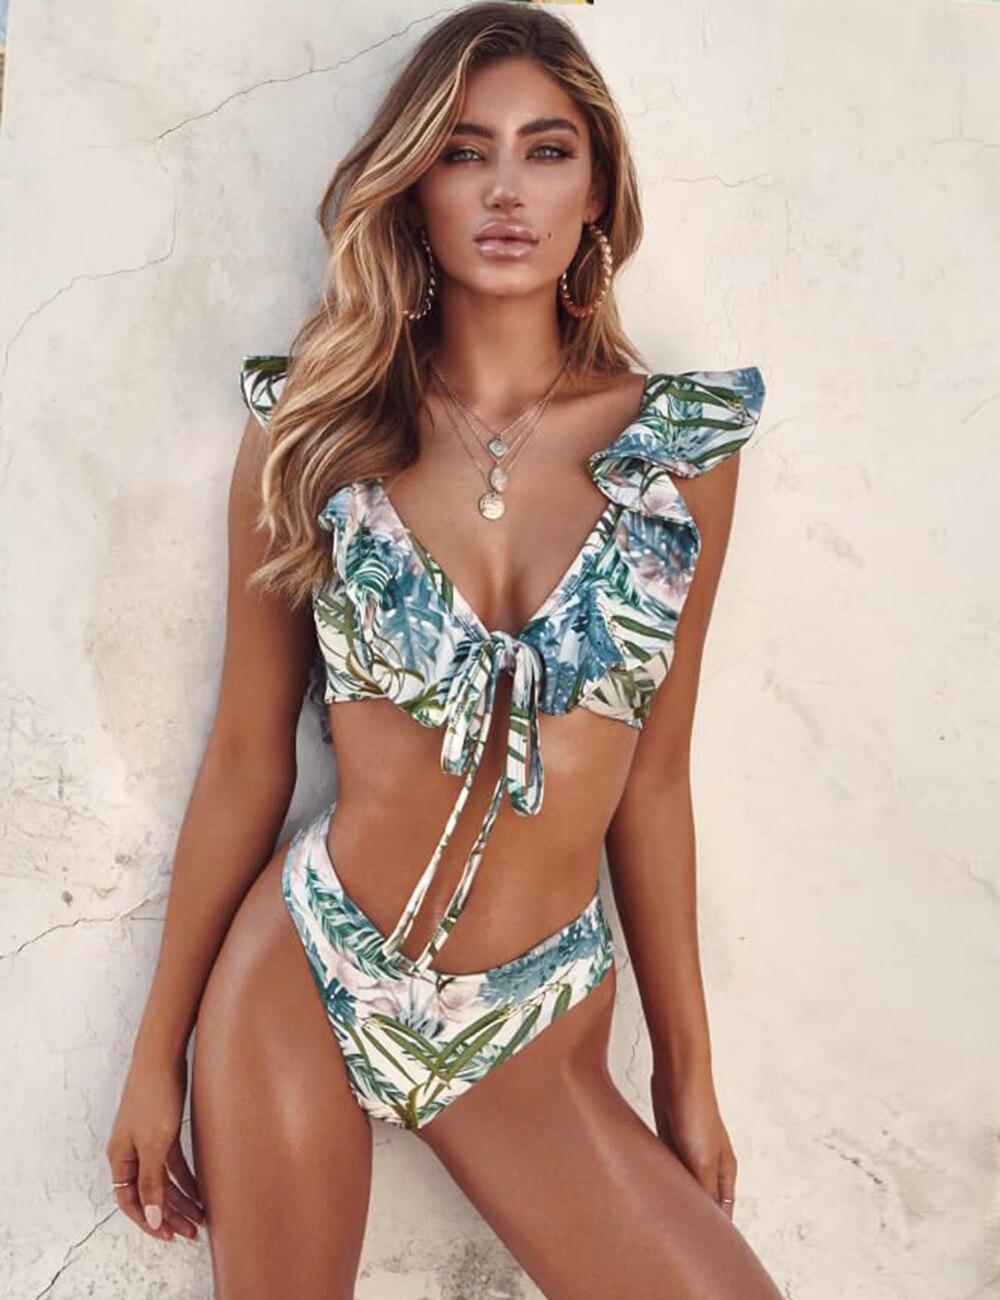 Hot Leaves Print Bikinis 2019 Rash Guards Ruffle Shoulder Women Bikini Set Bathing Suit Swimming Suits For Women Biquinis